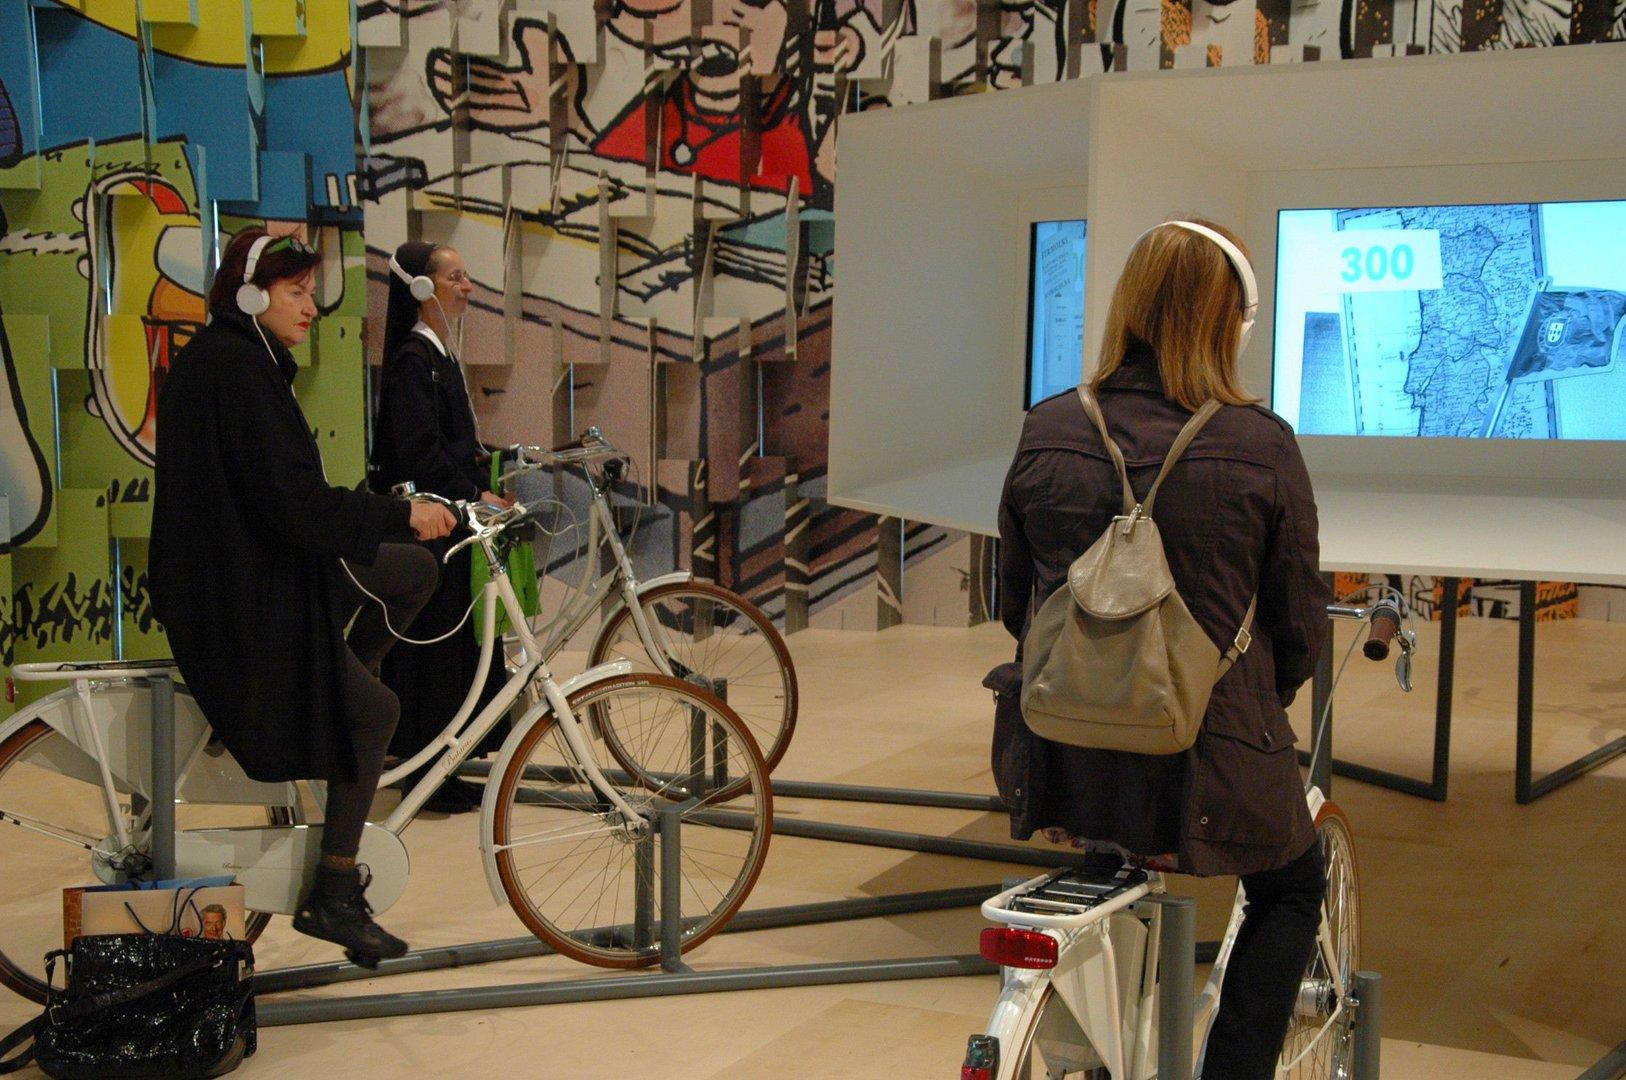 Brasilien-Pavillon: mit Fahrrädern Filme starten